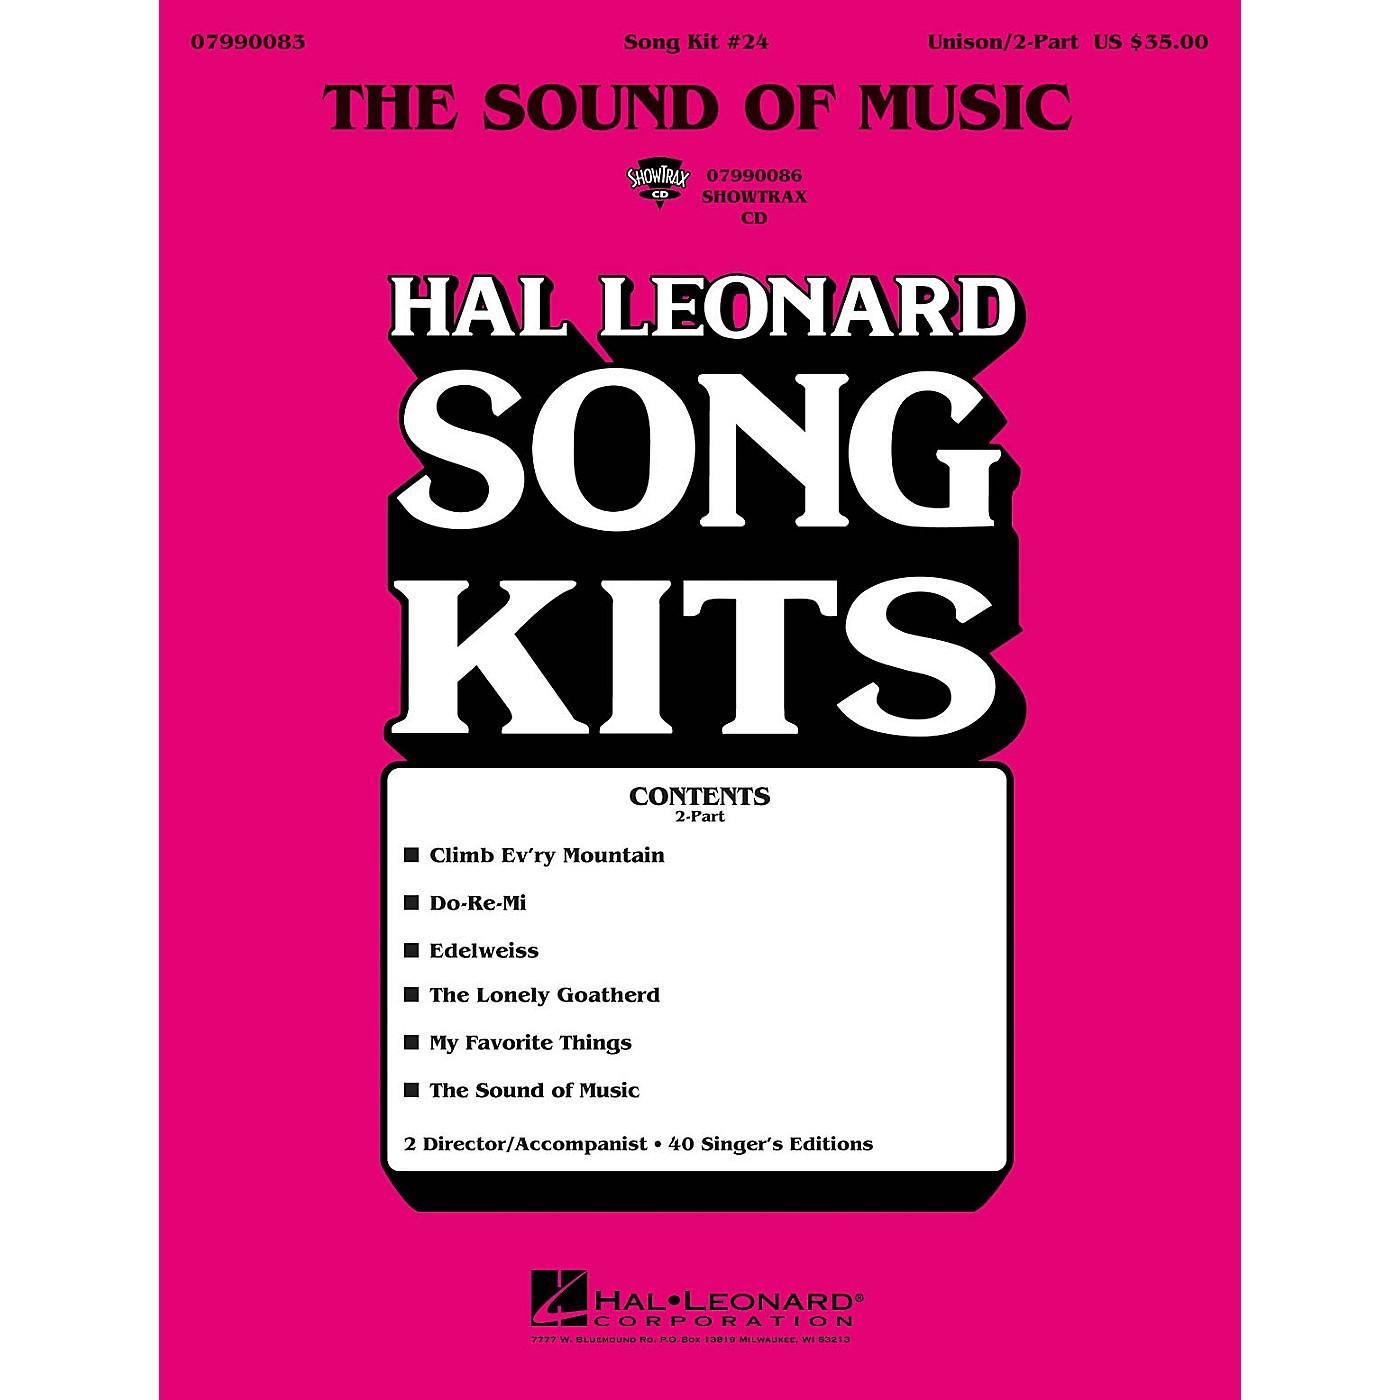 Hal Leonard The Sound of Music (Song Kit #24) UNIS/2PT Arranged by Dick Averre thumbnail